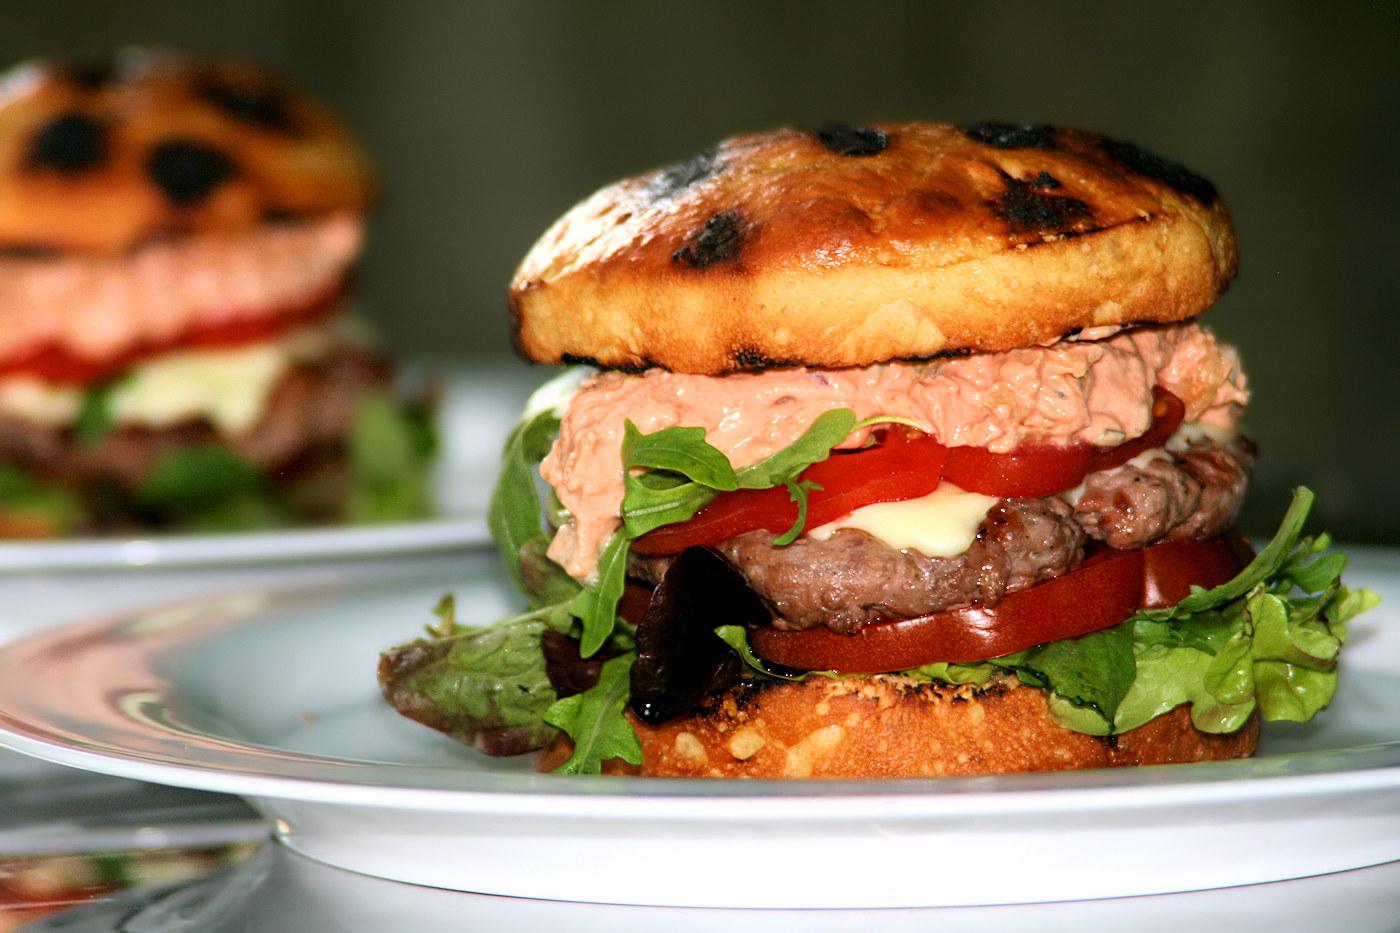 burger selber machen mein ultimatives burger rezept backen und kochen. Black Bedroom Furniture Sets. Home Design Ideas